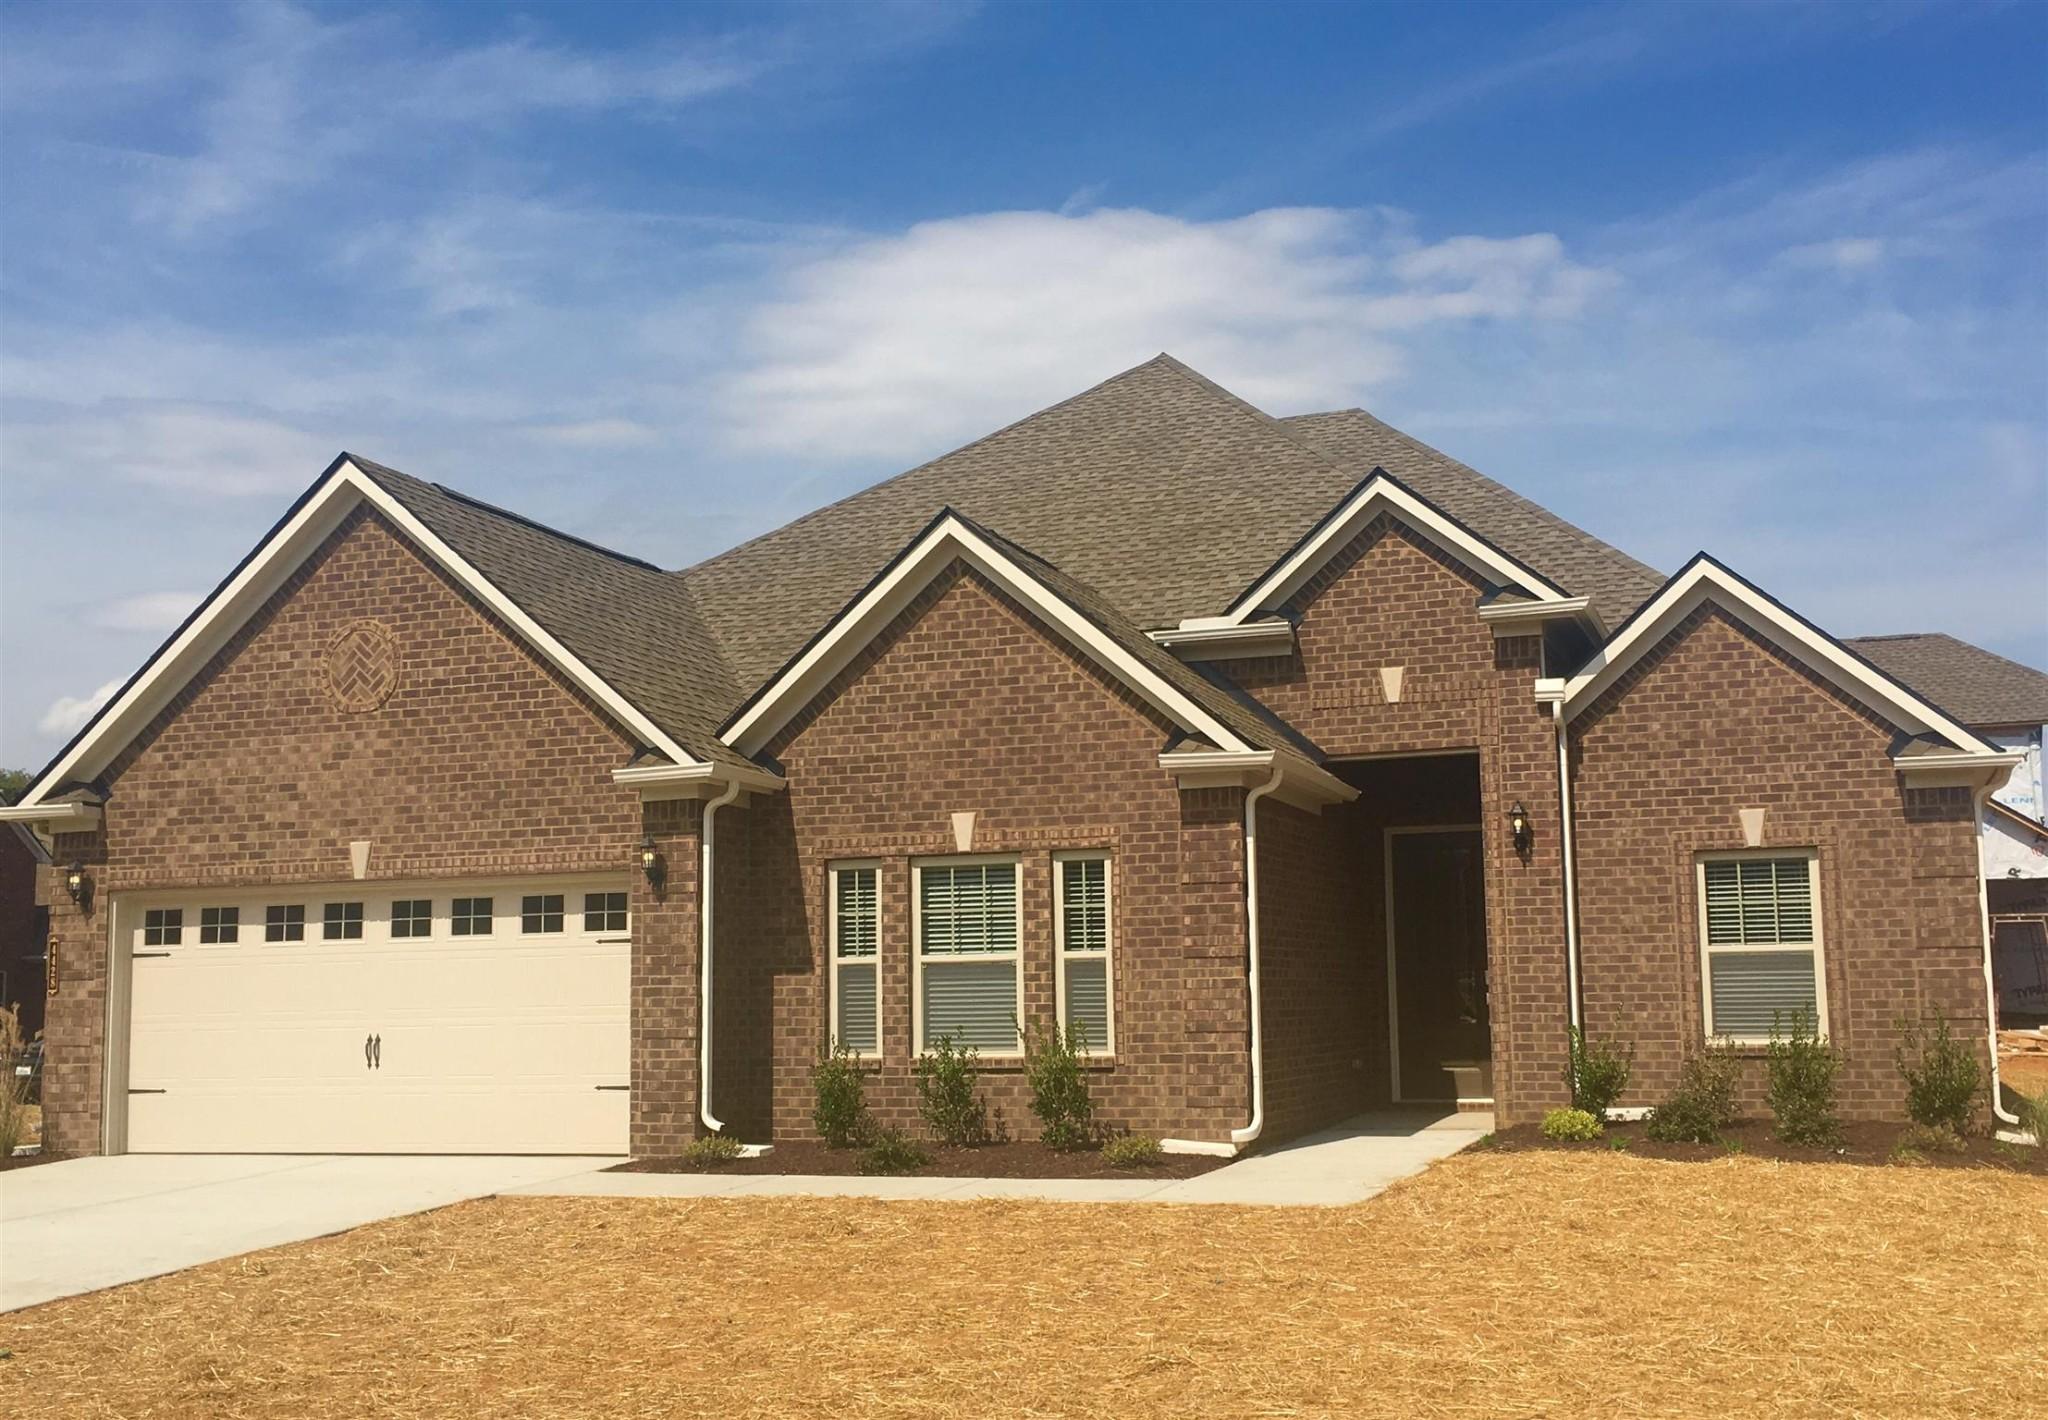 1637 Gingerwood Dr CHO 121, Murfreesboro, TN 37129 - Murfreesboro, TN real estate listing